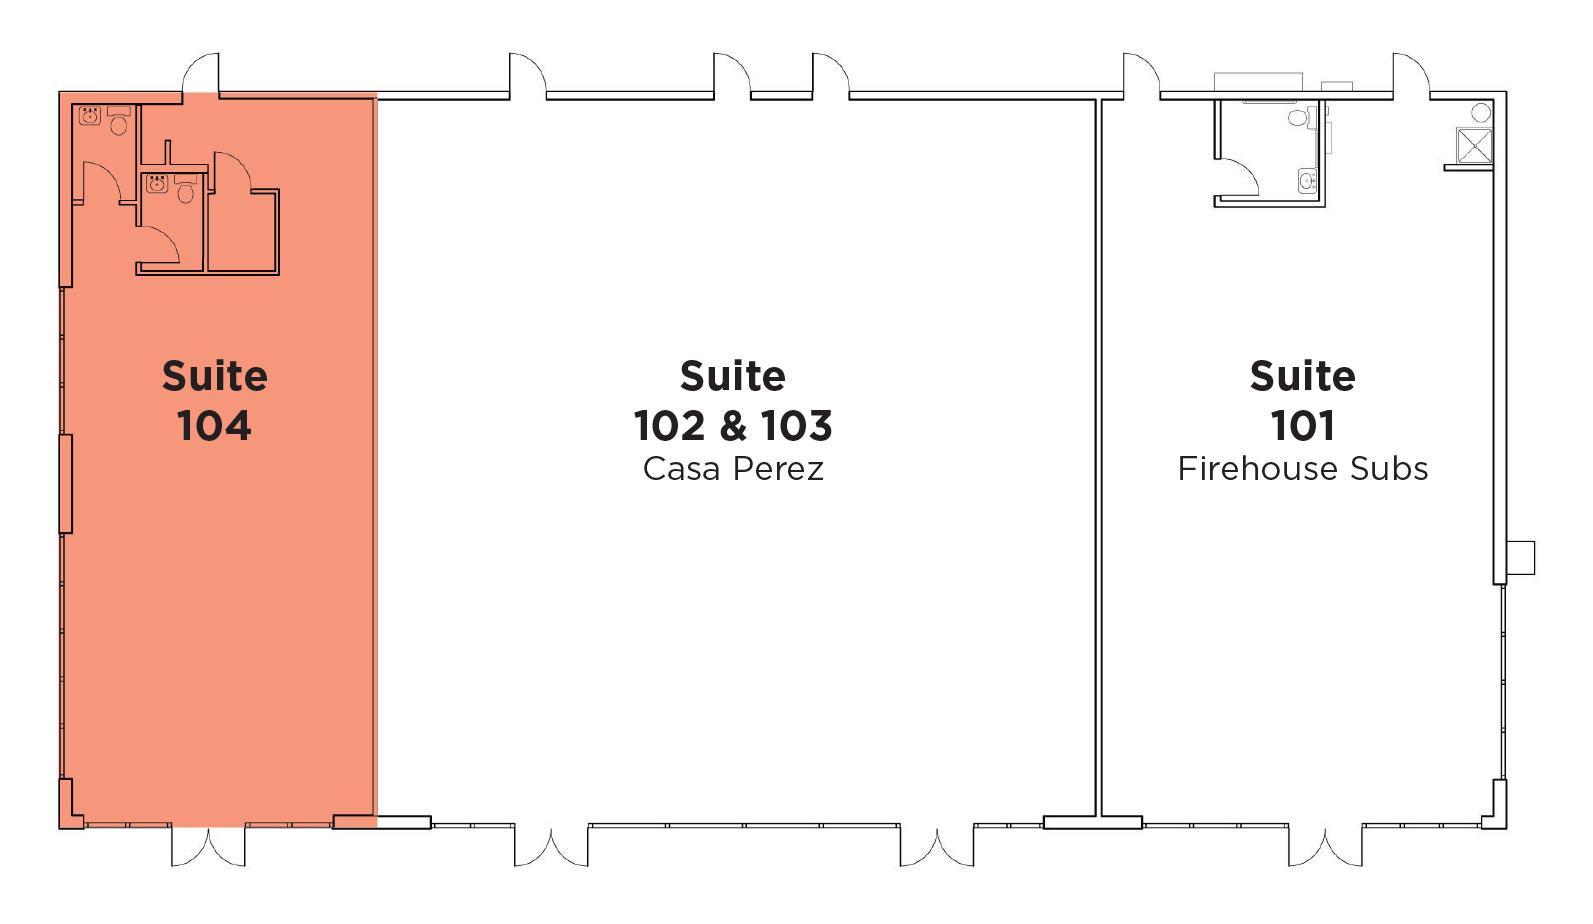 Frys-Neighborhood-Center-Pad-E-Suite-104-Floorplan-Overview